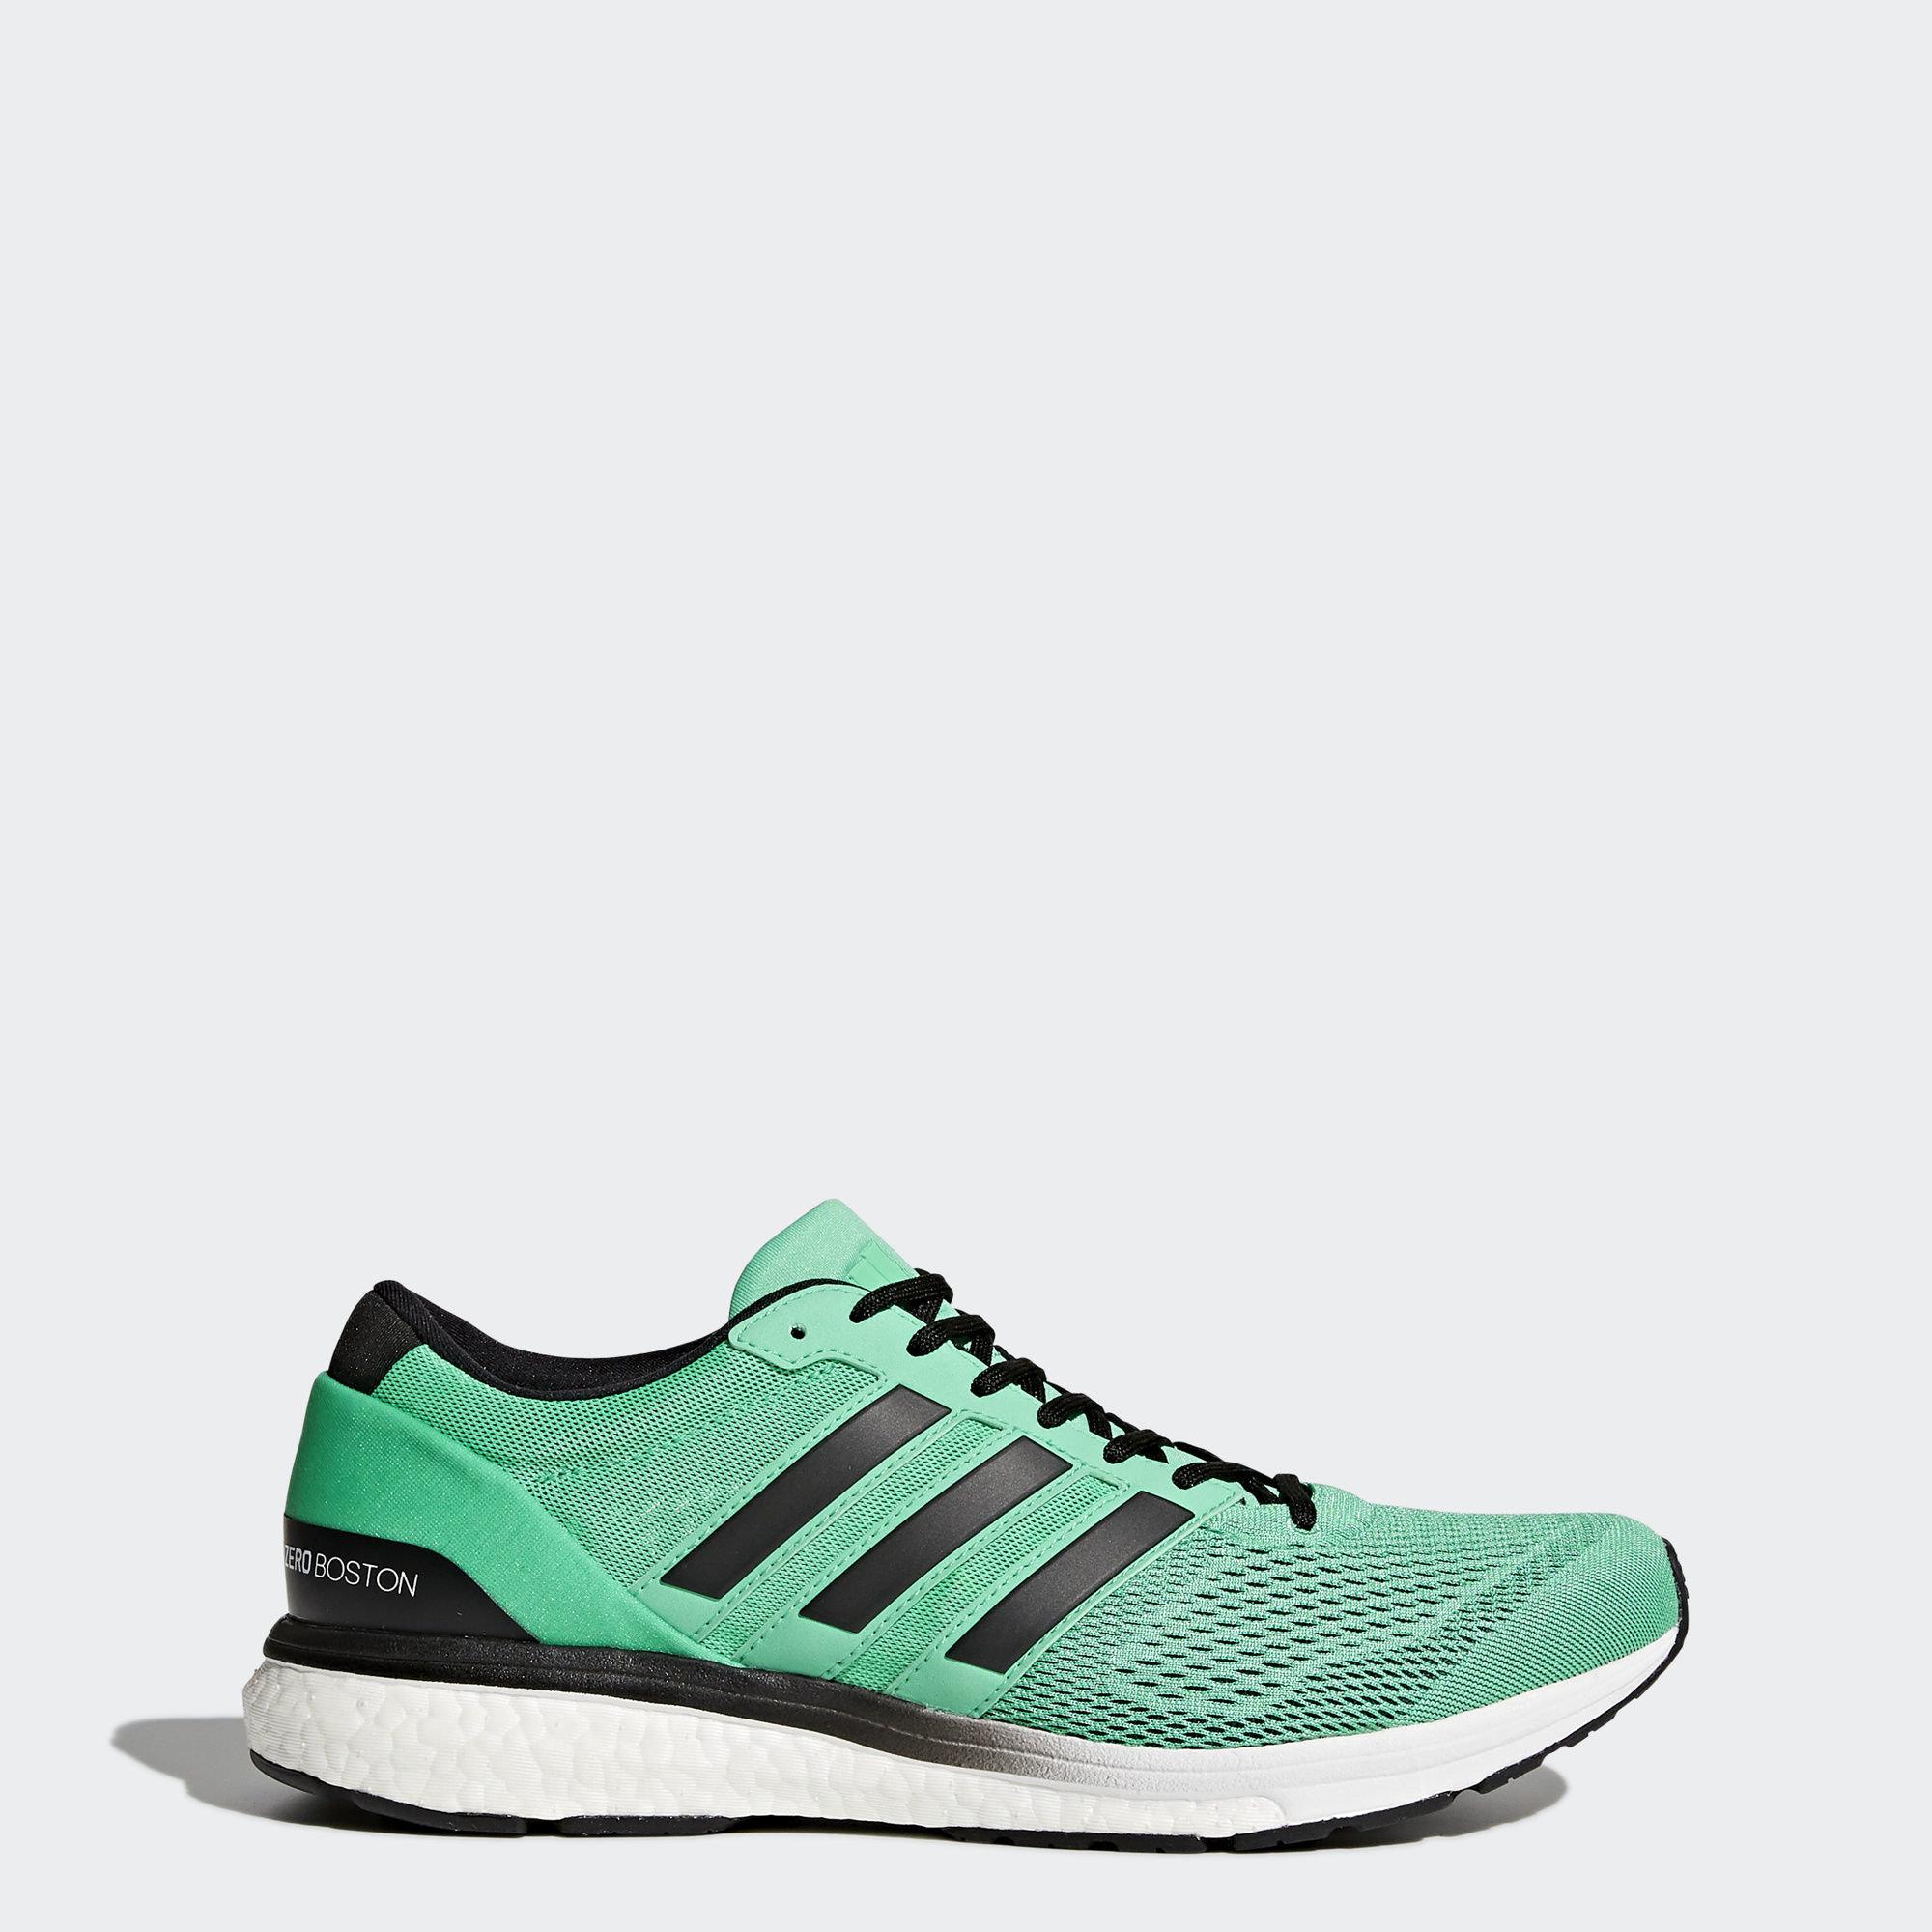 Кроссовки для бега adizero Boston 6 adidas Performance Hi-Res Green/Core Black/Ftwr White